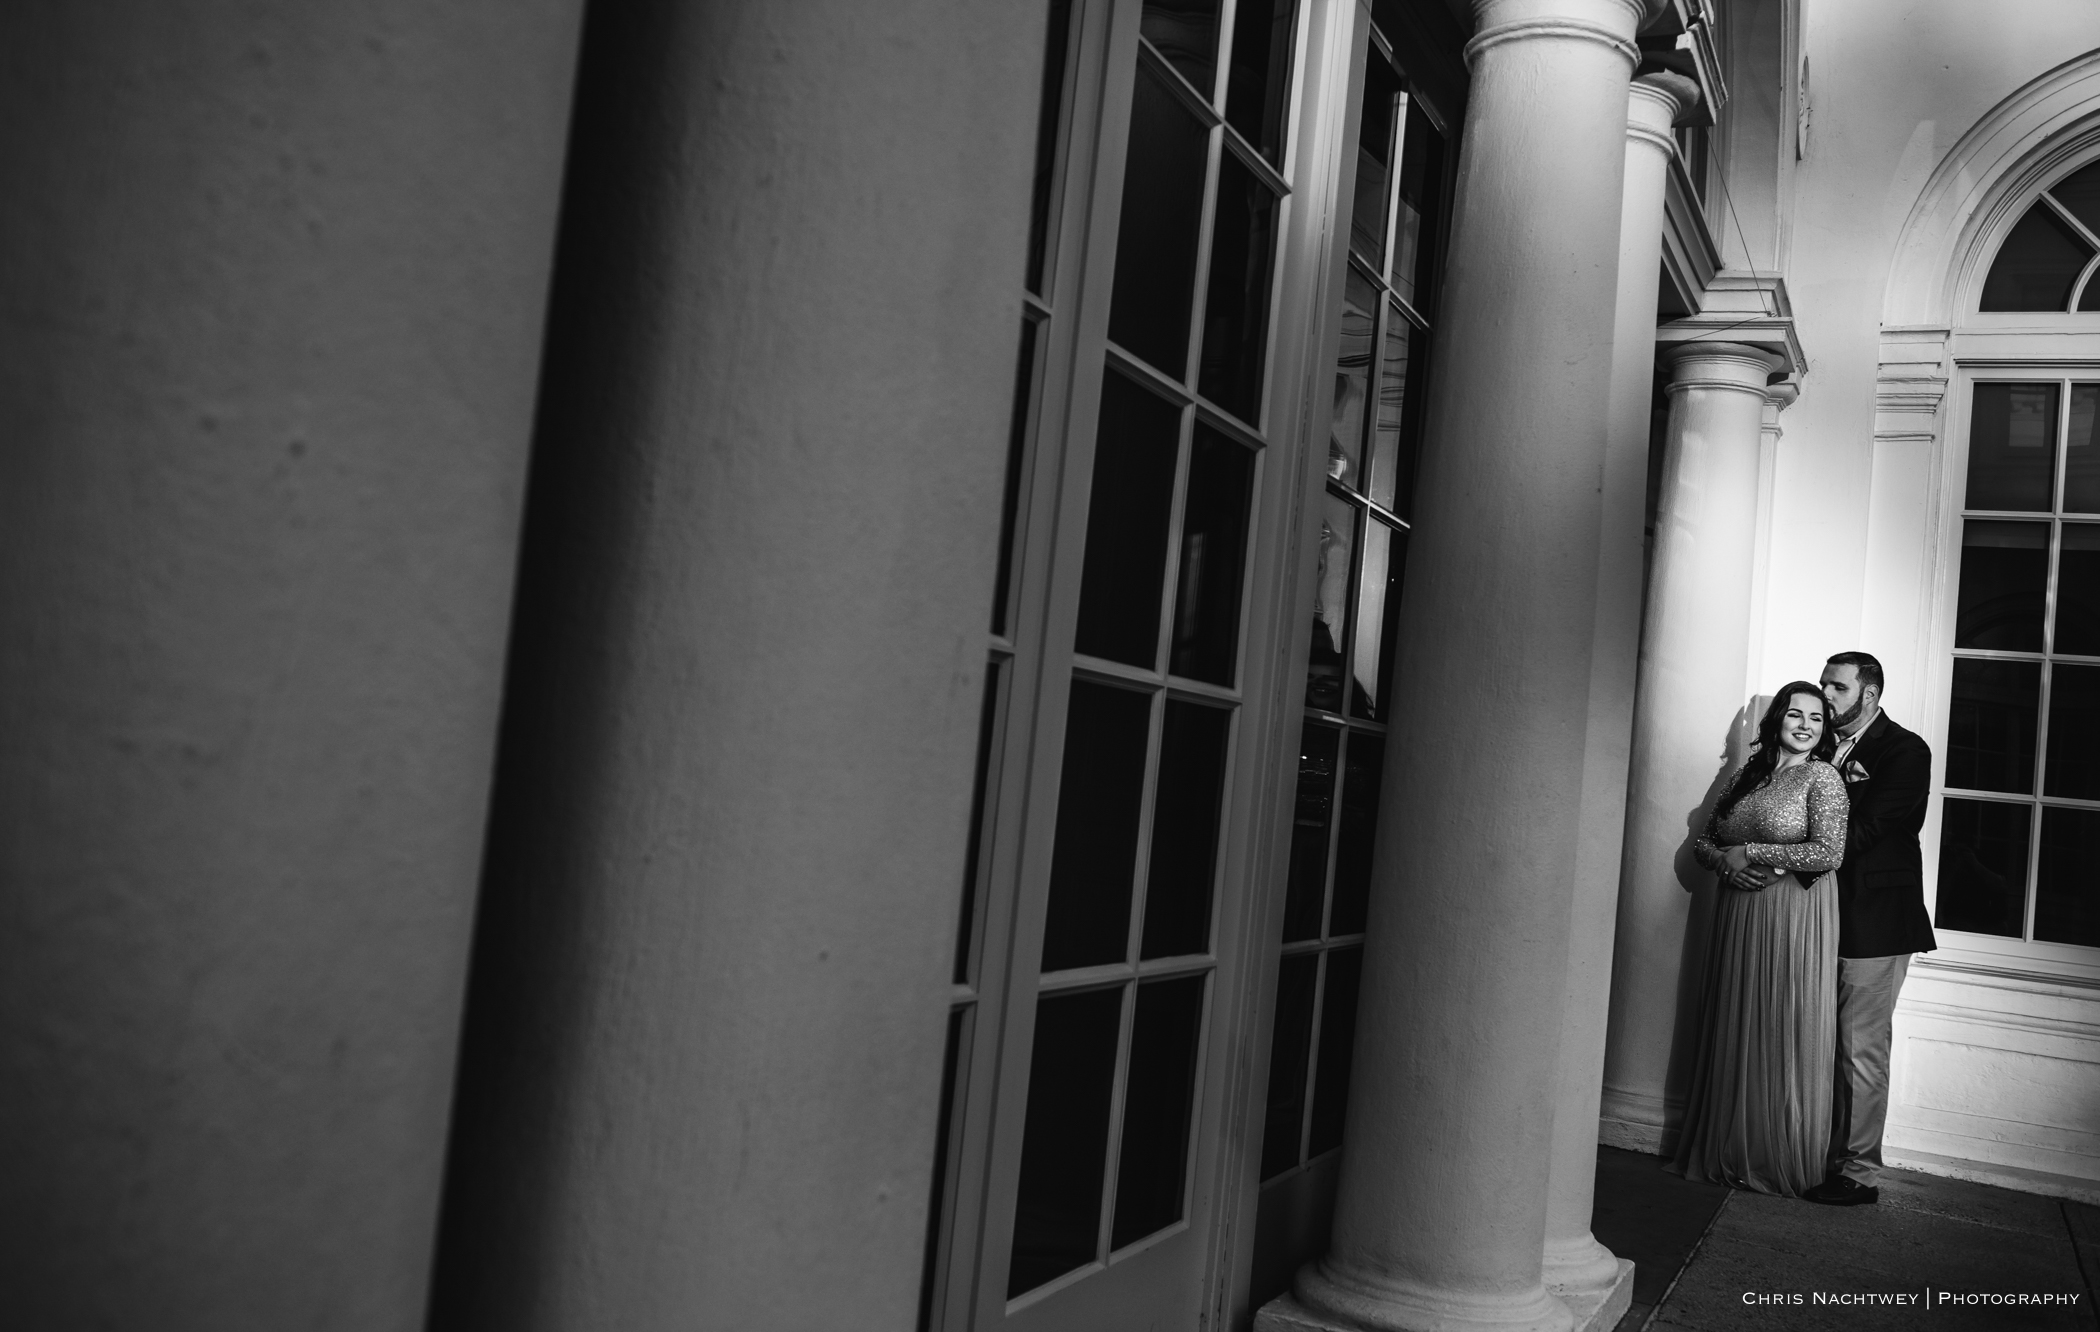 engagement-photos-wadsworth-mansion-ct-chris-nachtwey-photography-2017-9.jpg